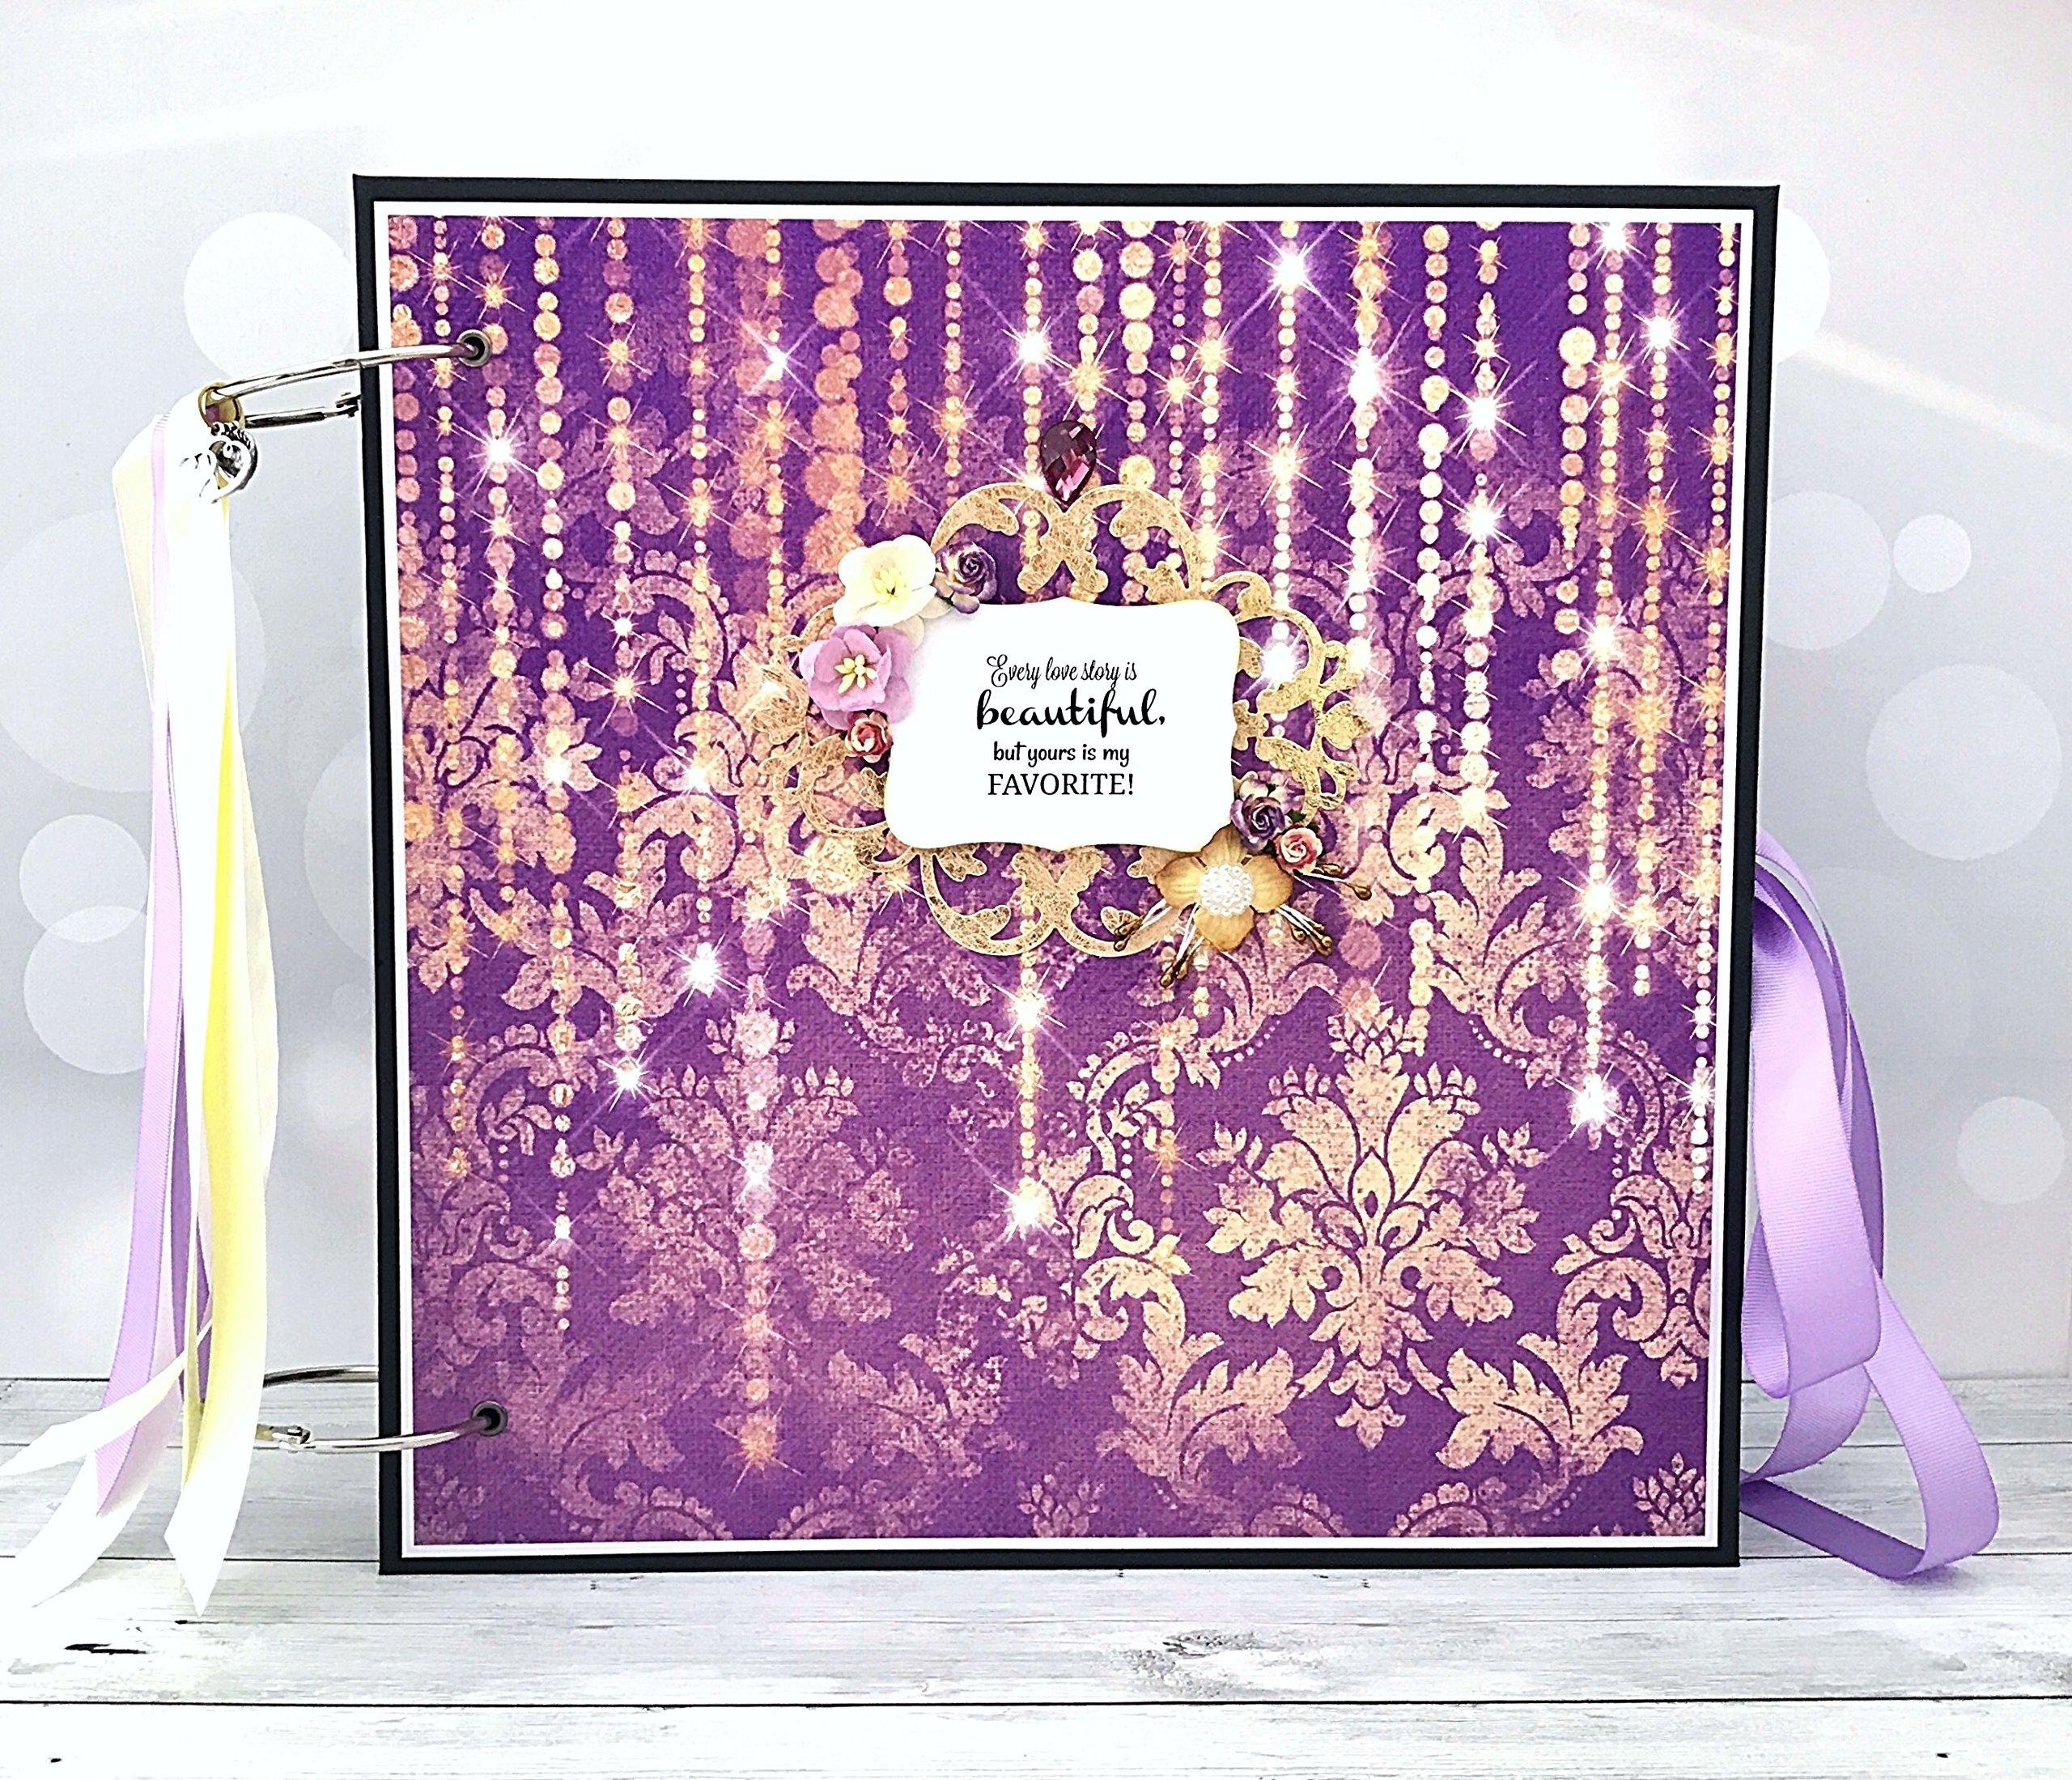 Kristabella Creations 12x12 Wedding memory book, metal rings binder, Wedding Photo Album, Anniversary scrapbook album, Wedding Gift